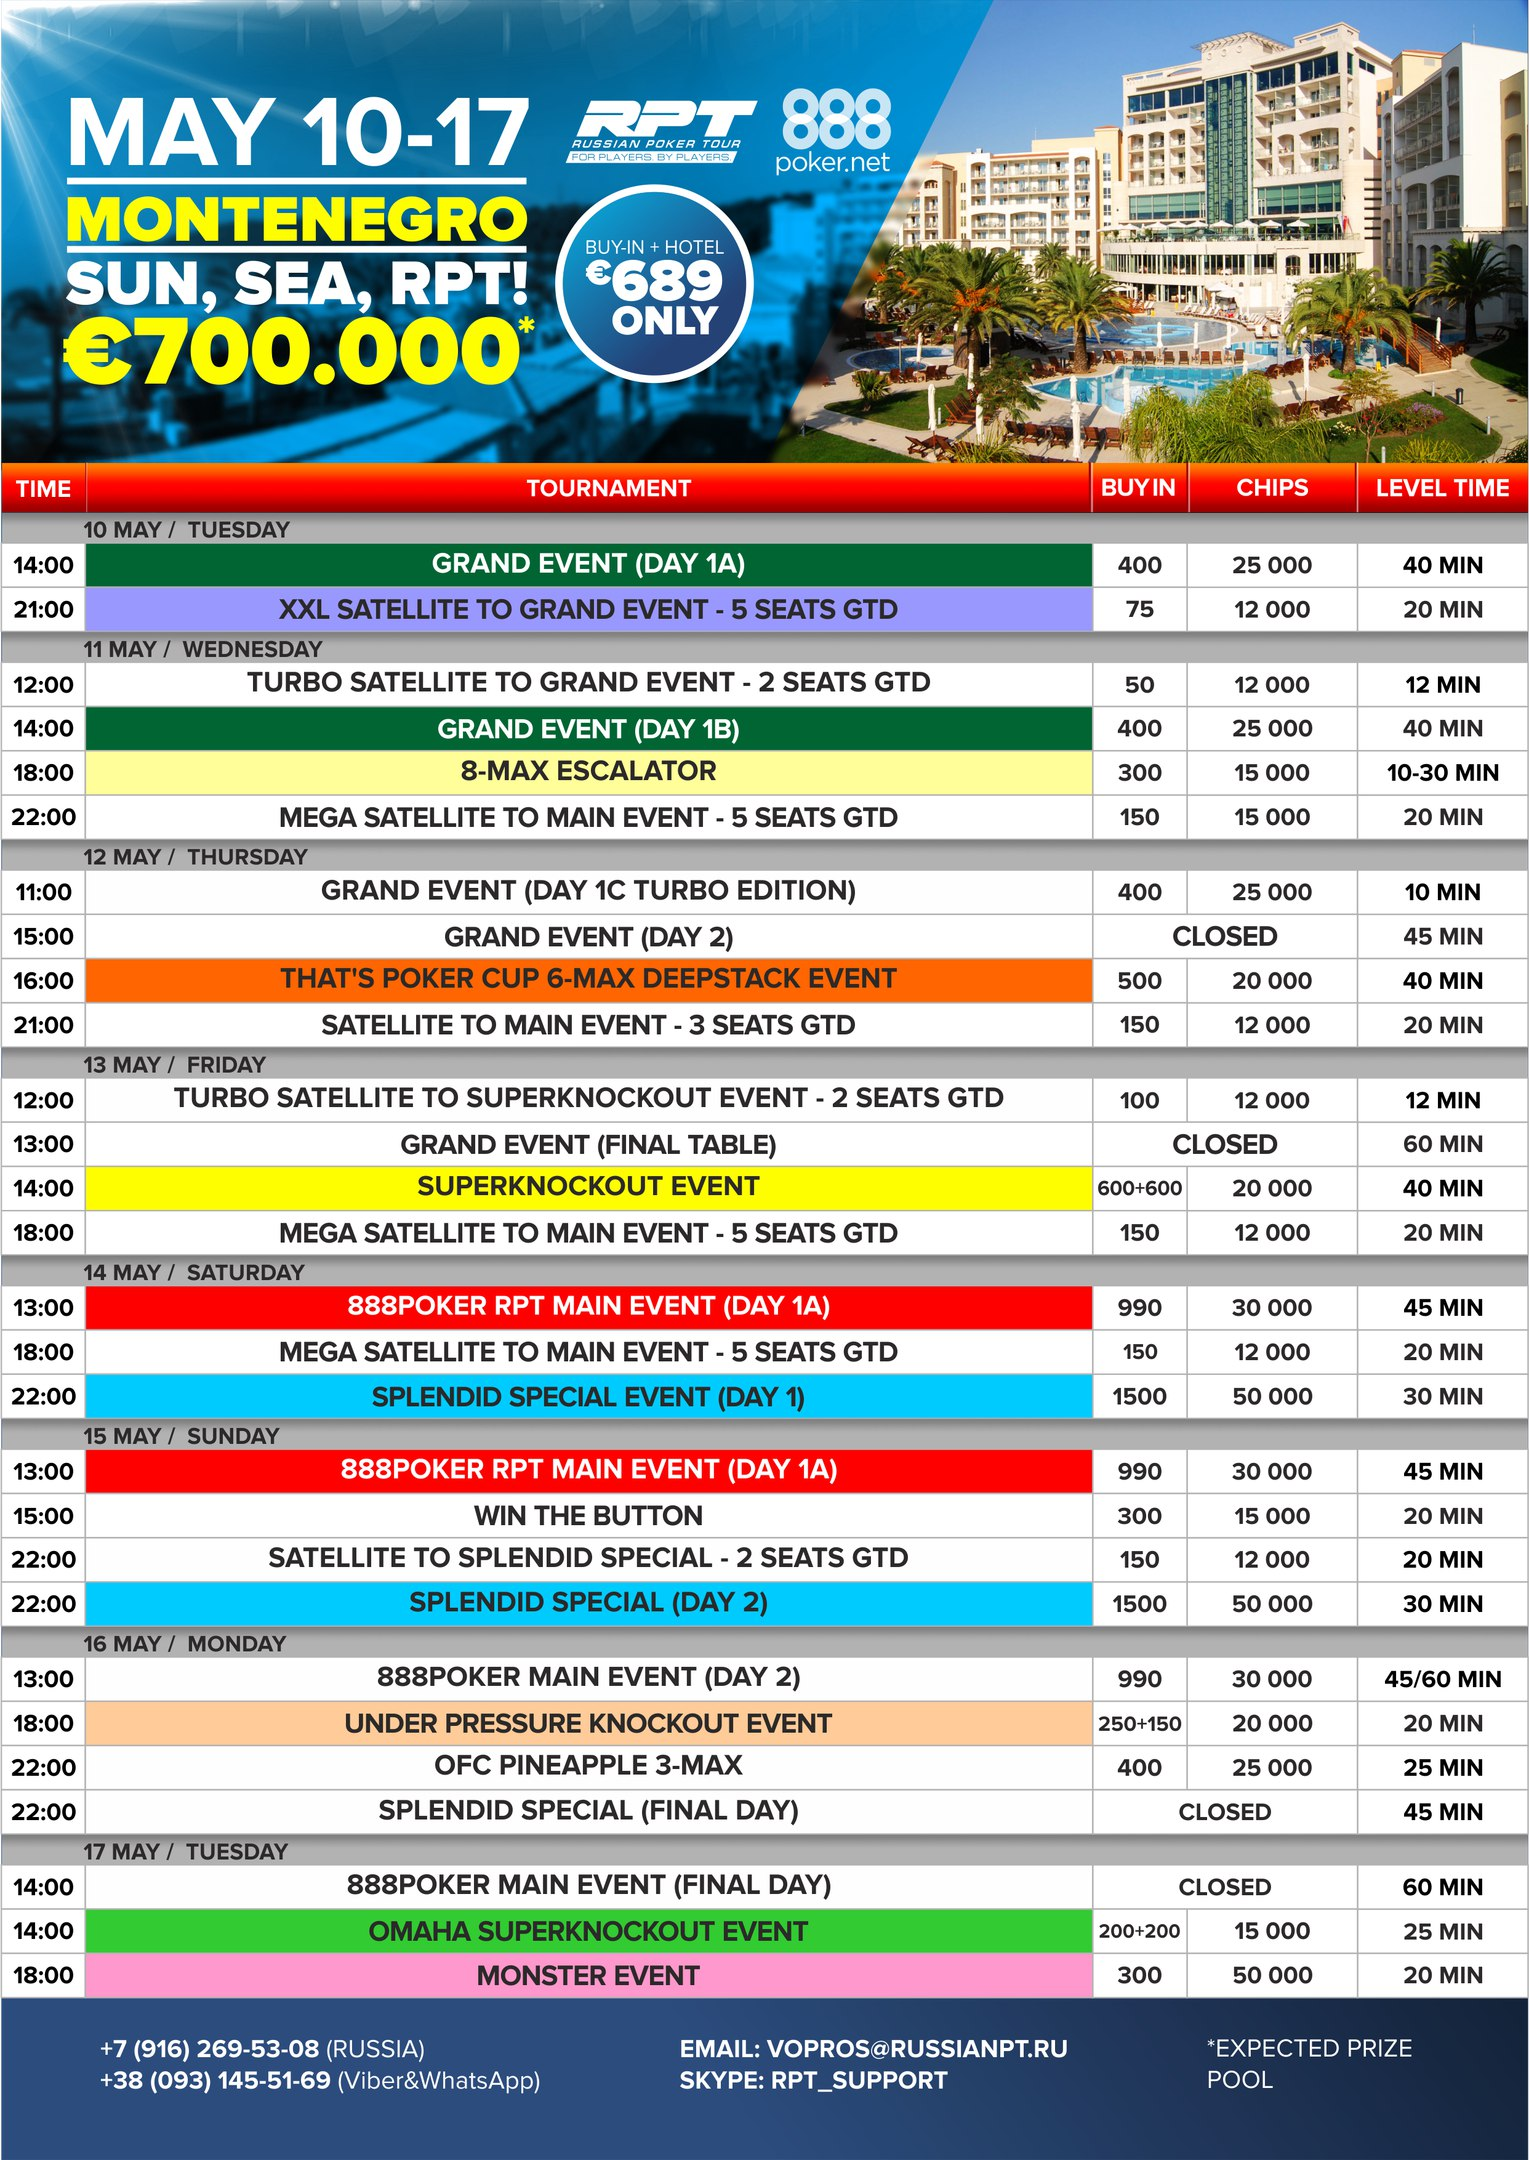 Montenegro RPT & 888poker Festival od 10. do 17. Maja u Splendidu 102